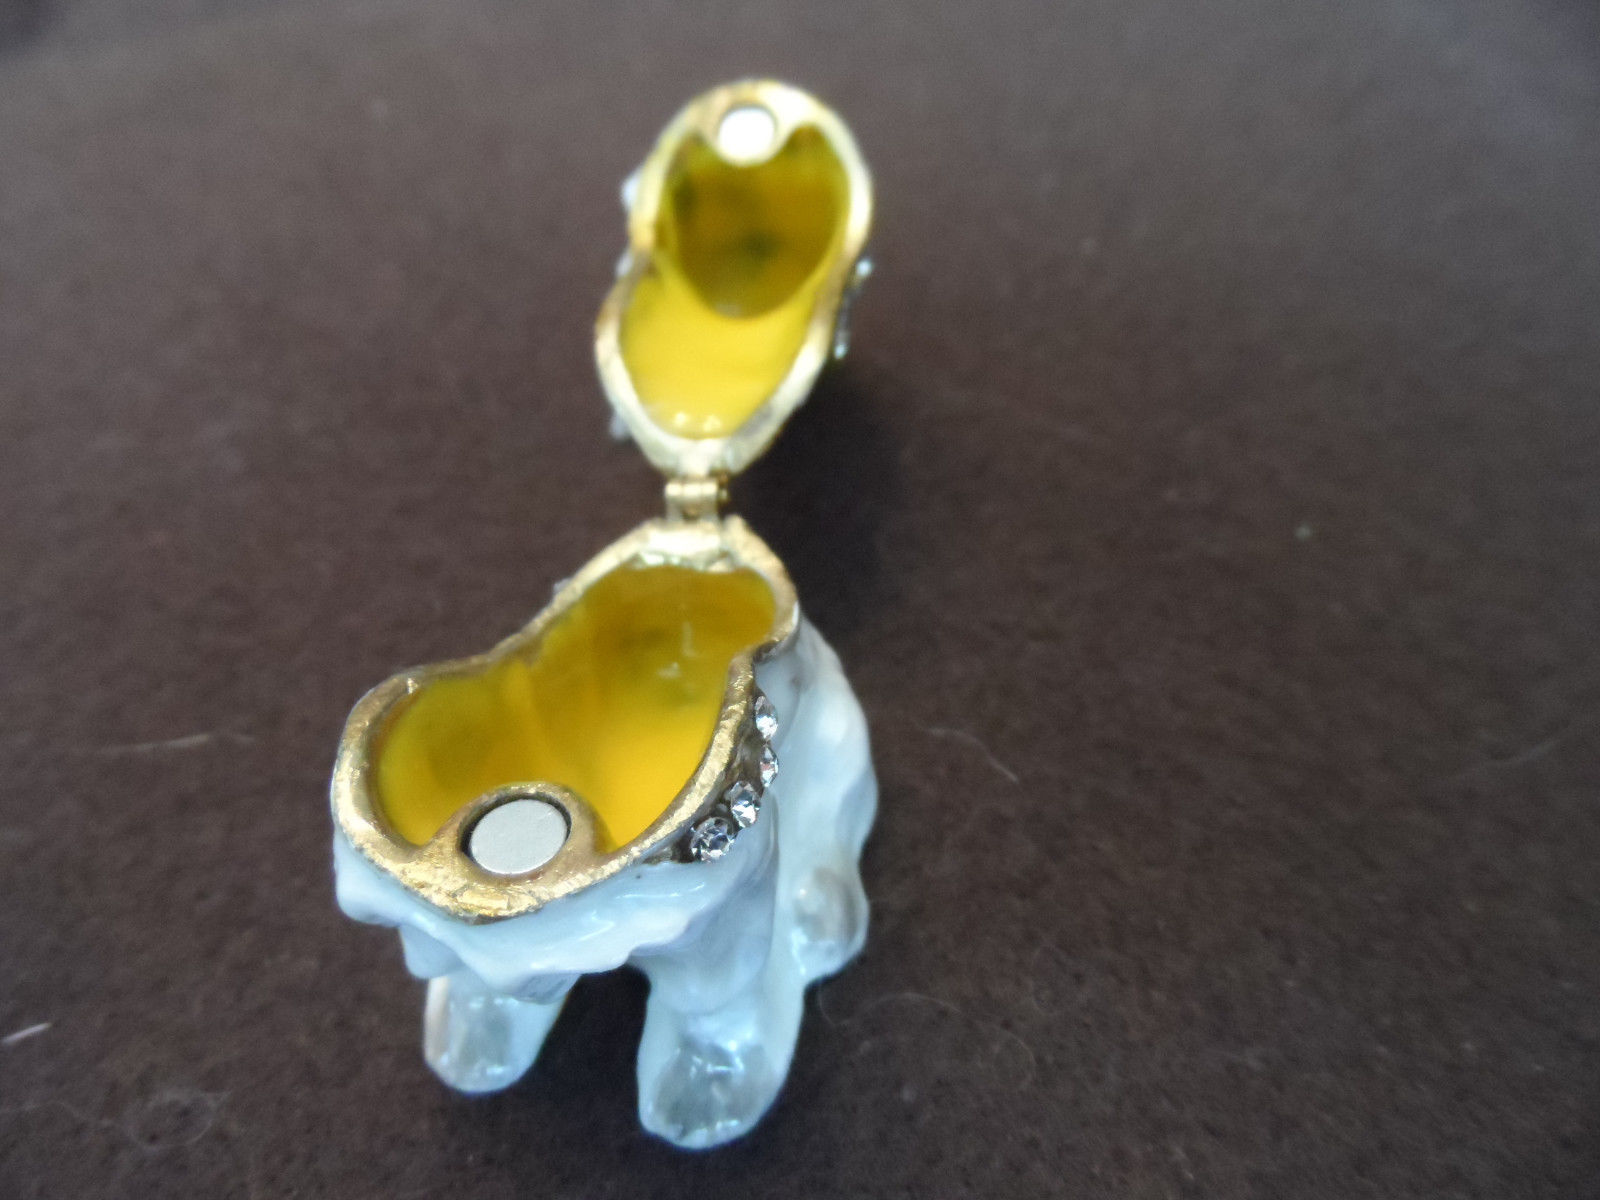 New metal hinged, jeweled trinket box - choice image 14